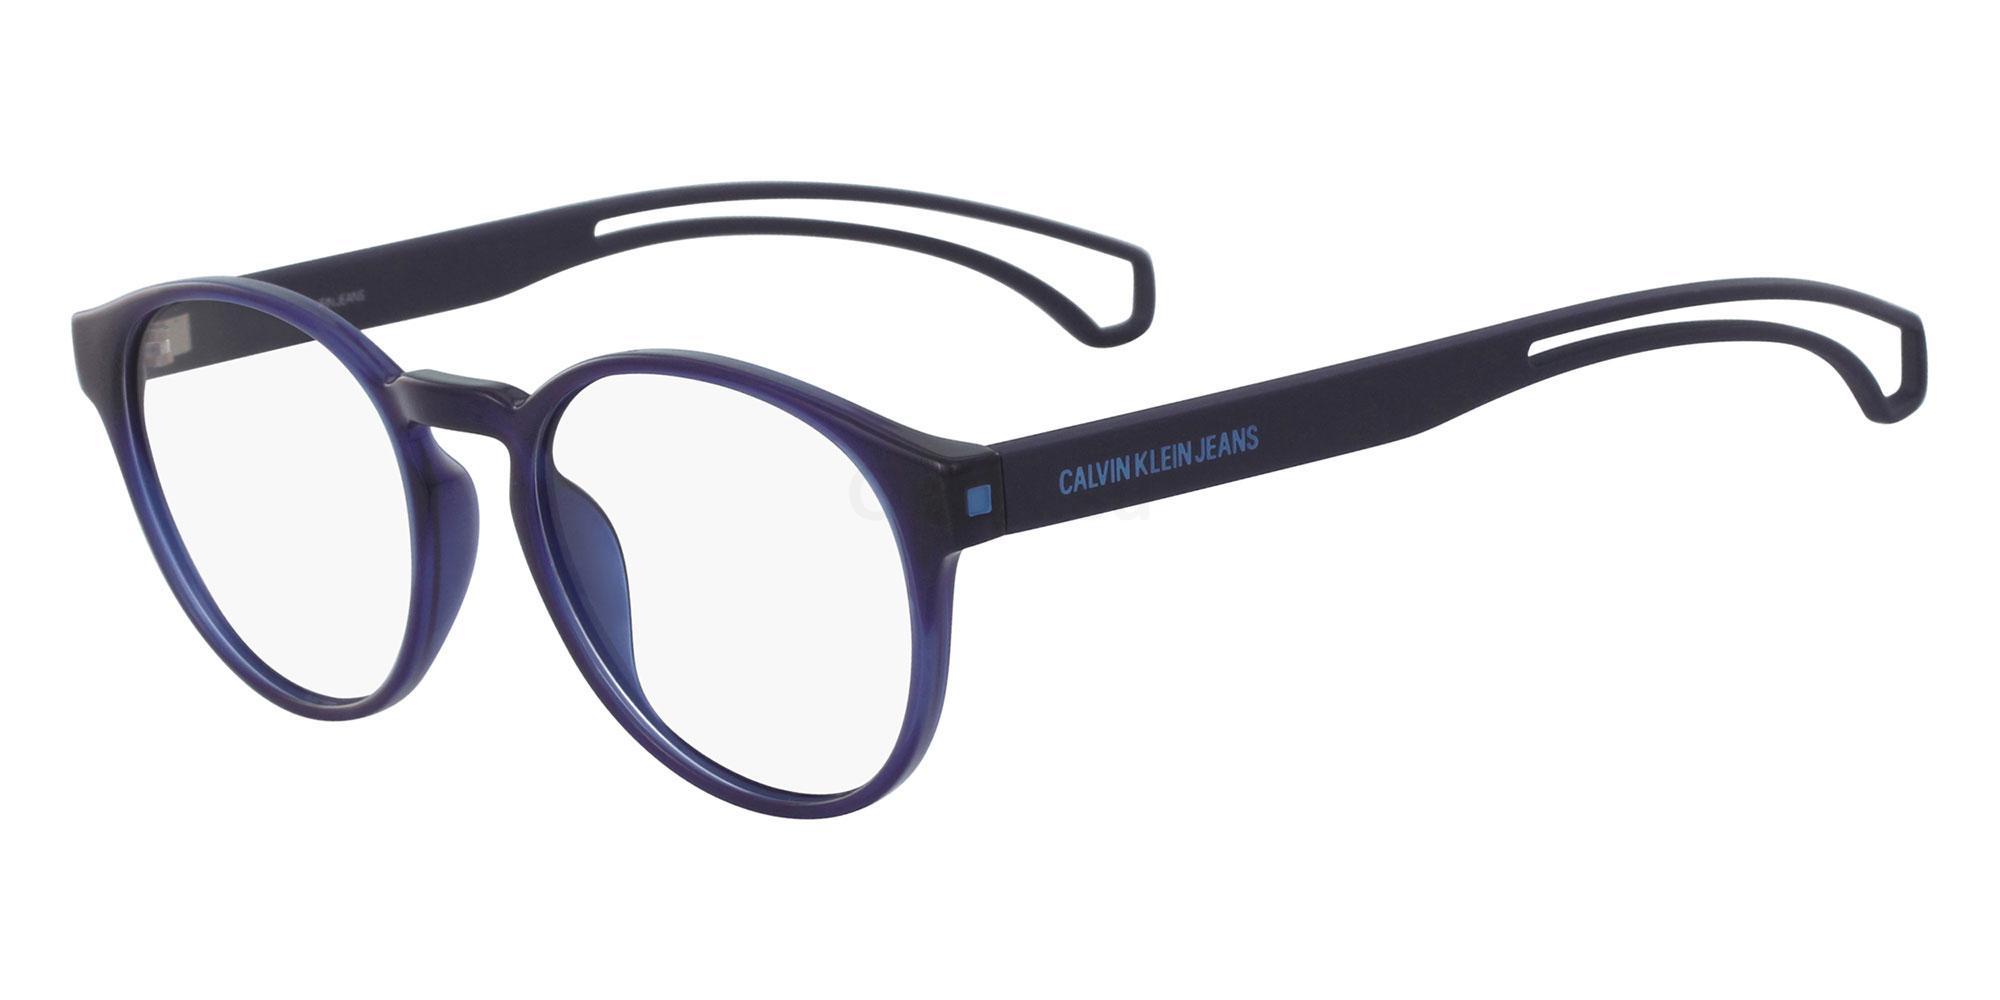 405 CKJ19508 Glasses, Calvin Klein Jeans